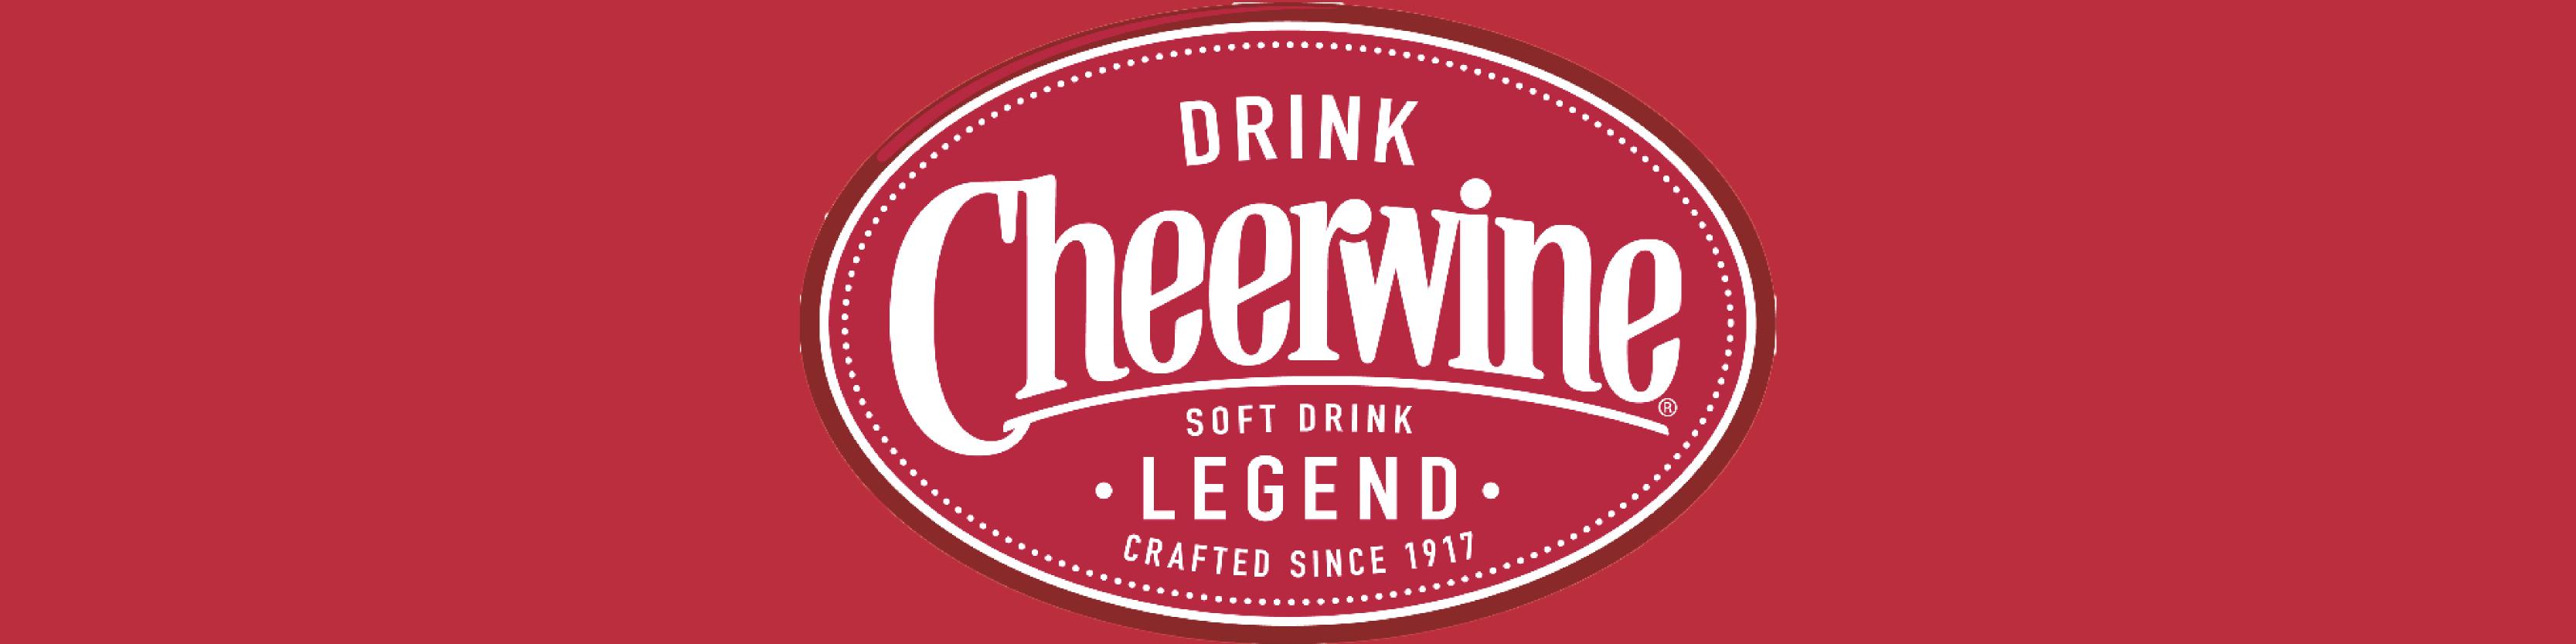 cheerwine-bannerx.png